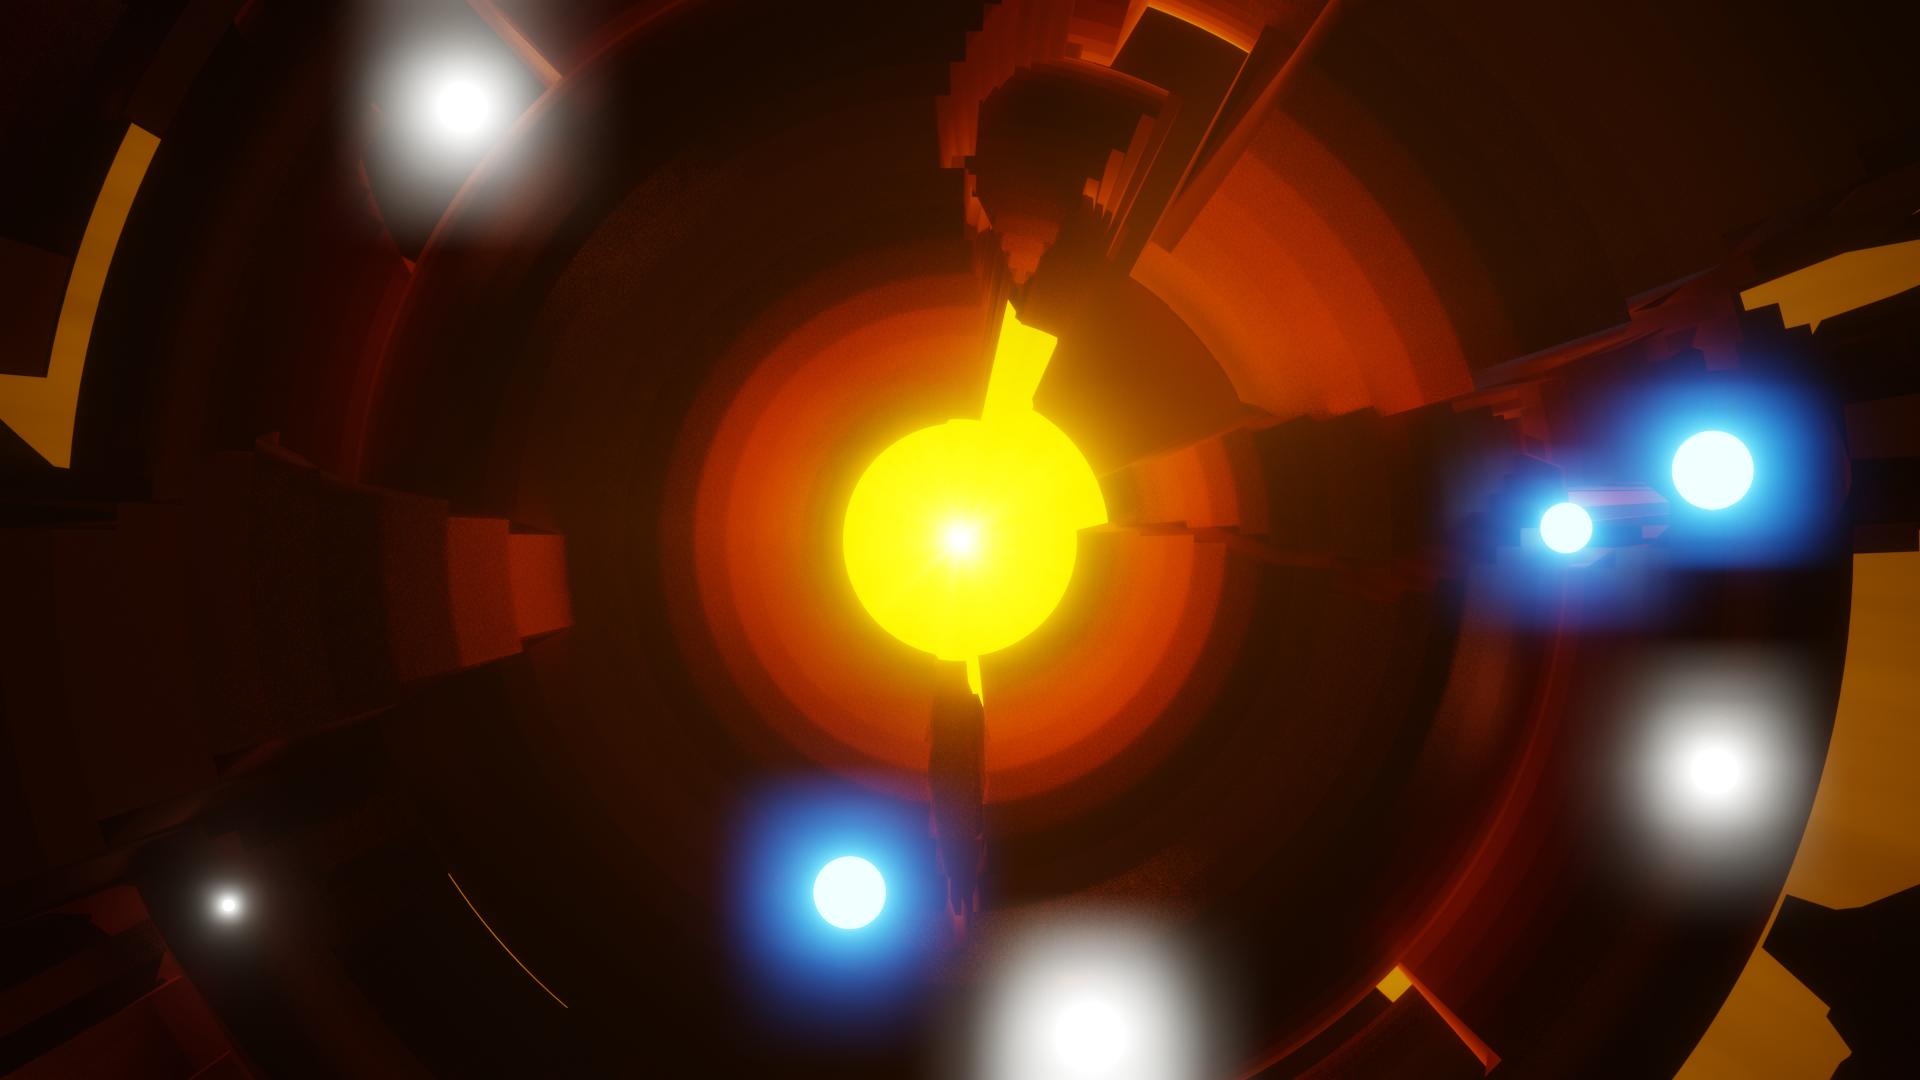 Sci-Fi Wormhole